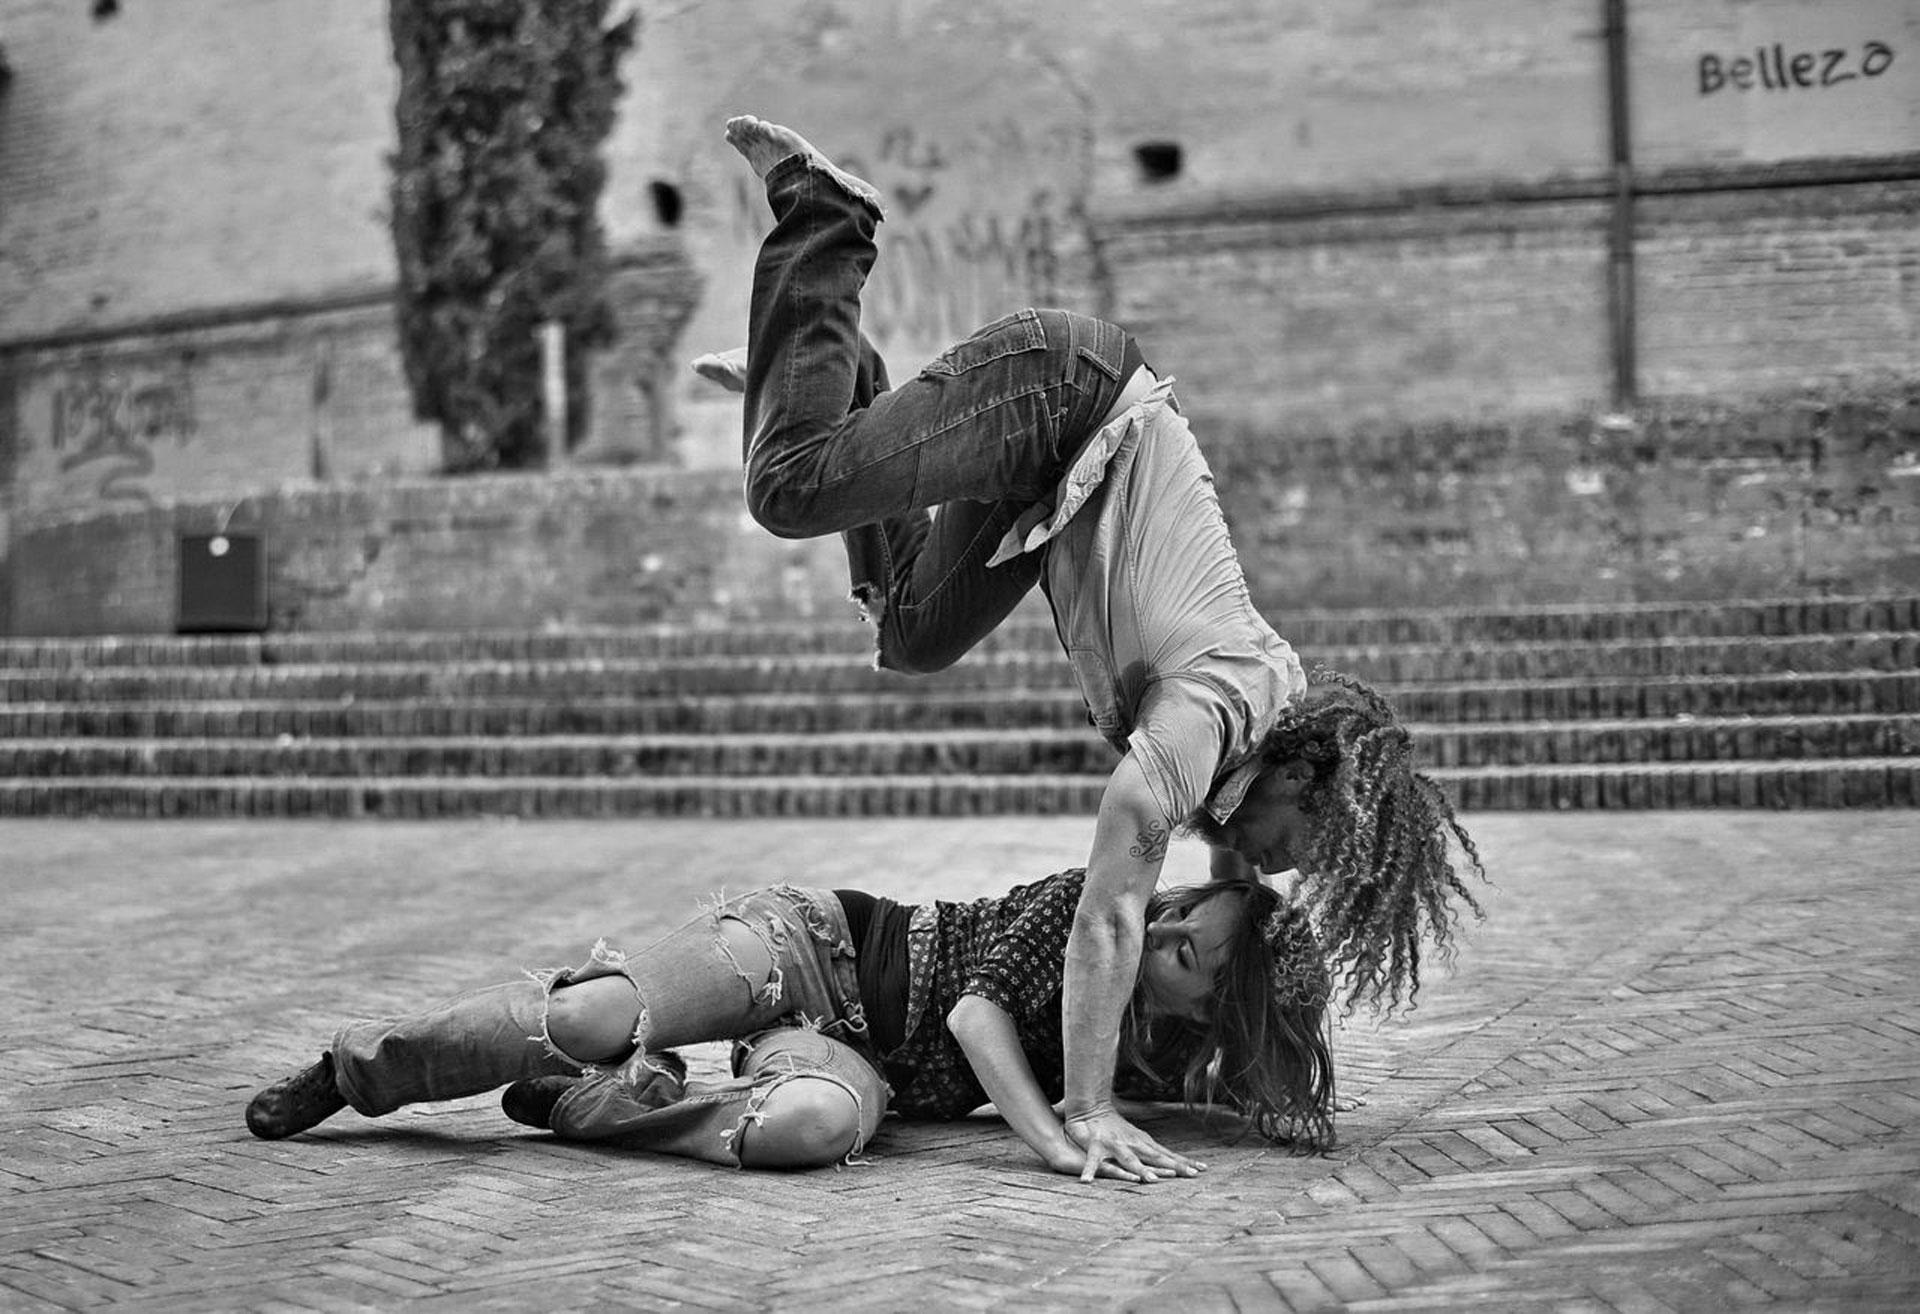 https://www.danzaurbana.eu/associazione/wp-content/uploads/2017/06/zuppiroli.jpg